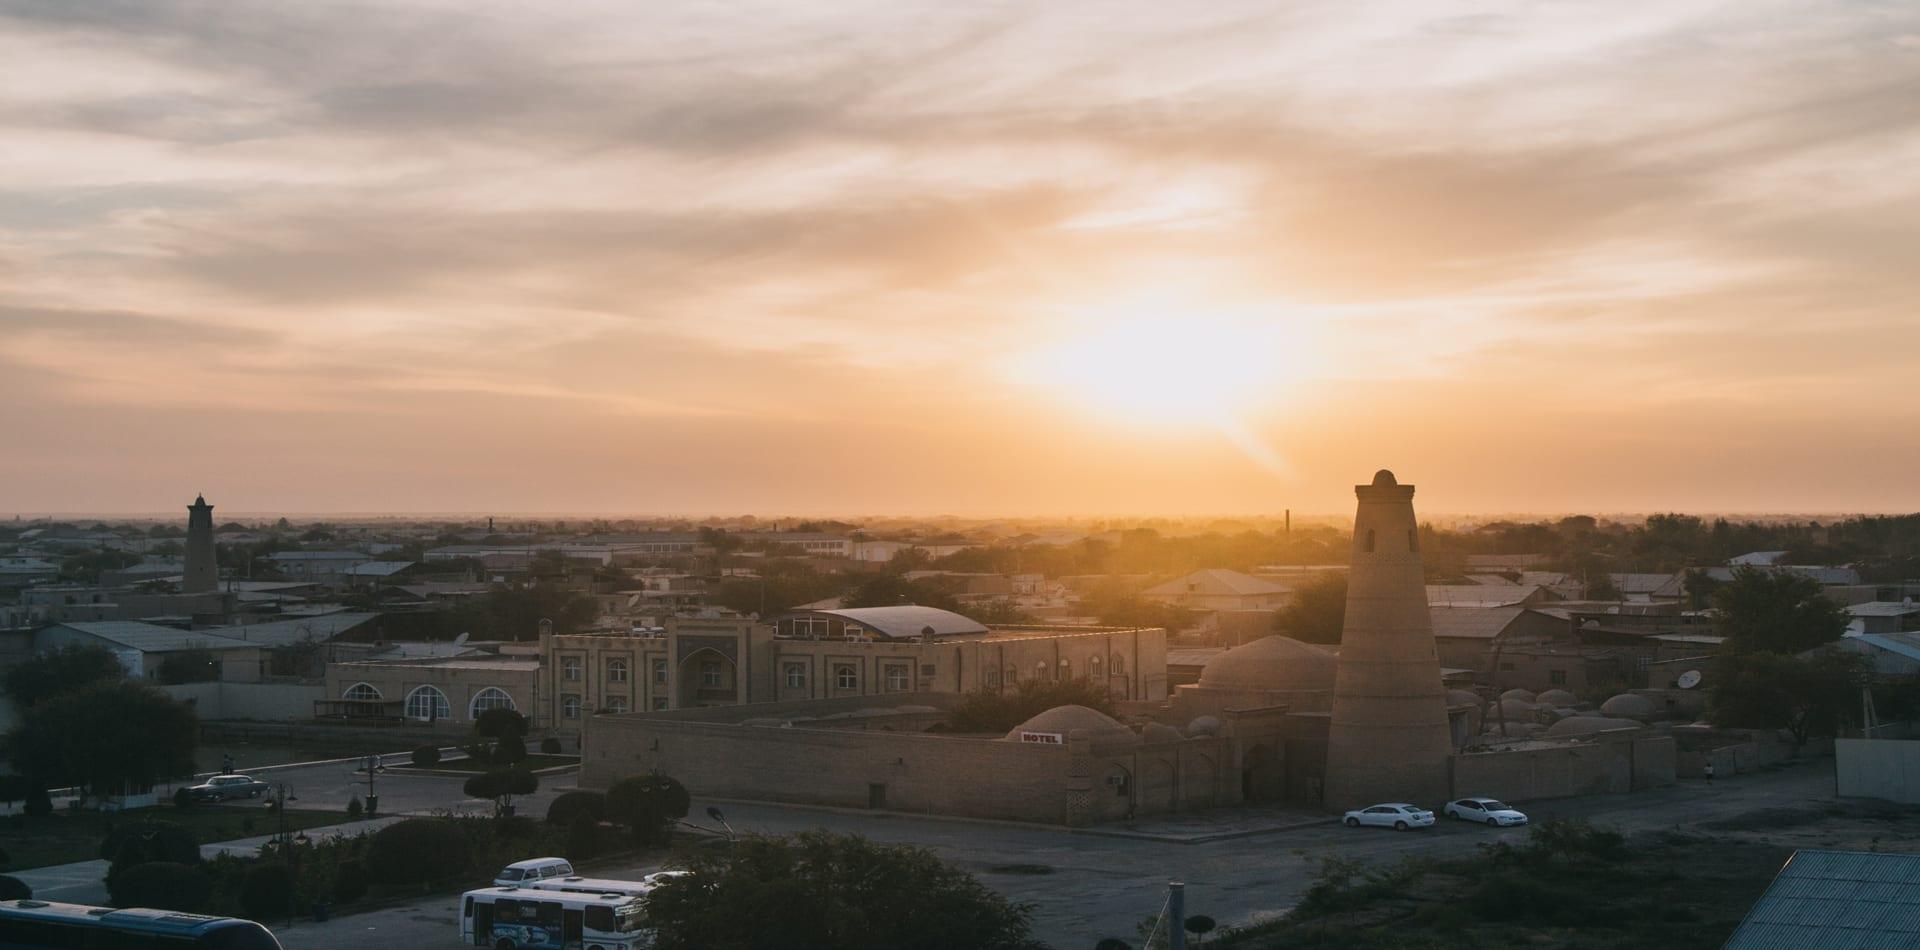 Uzbekistan sunset over Khiva city mosque